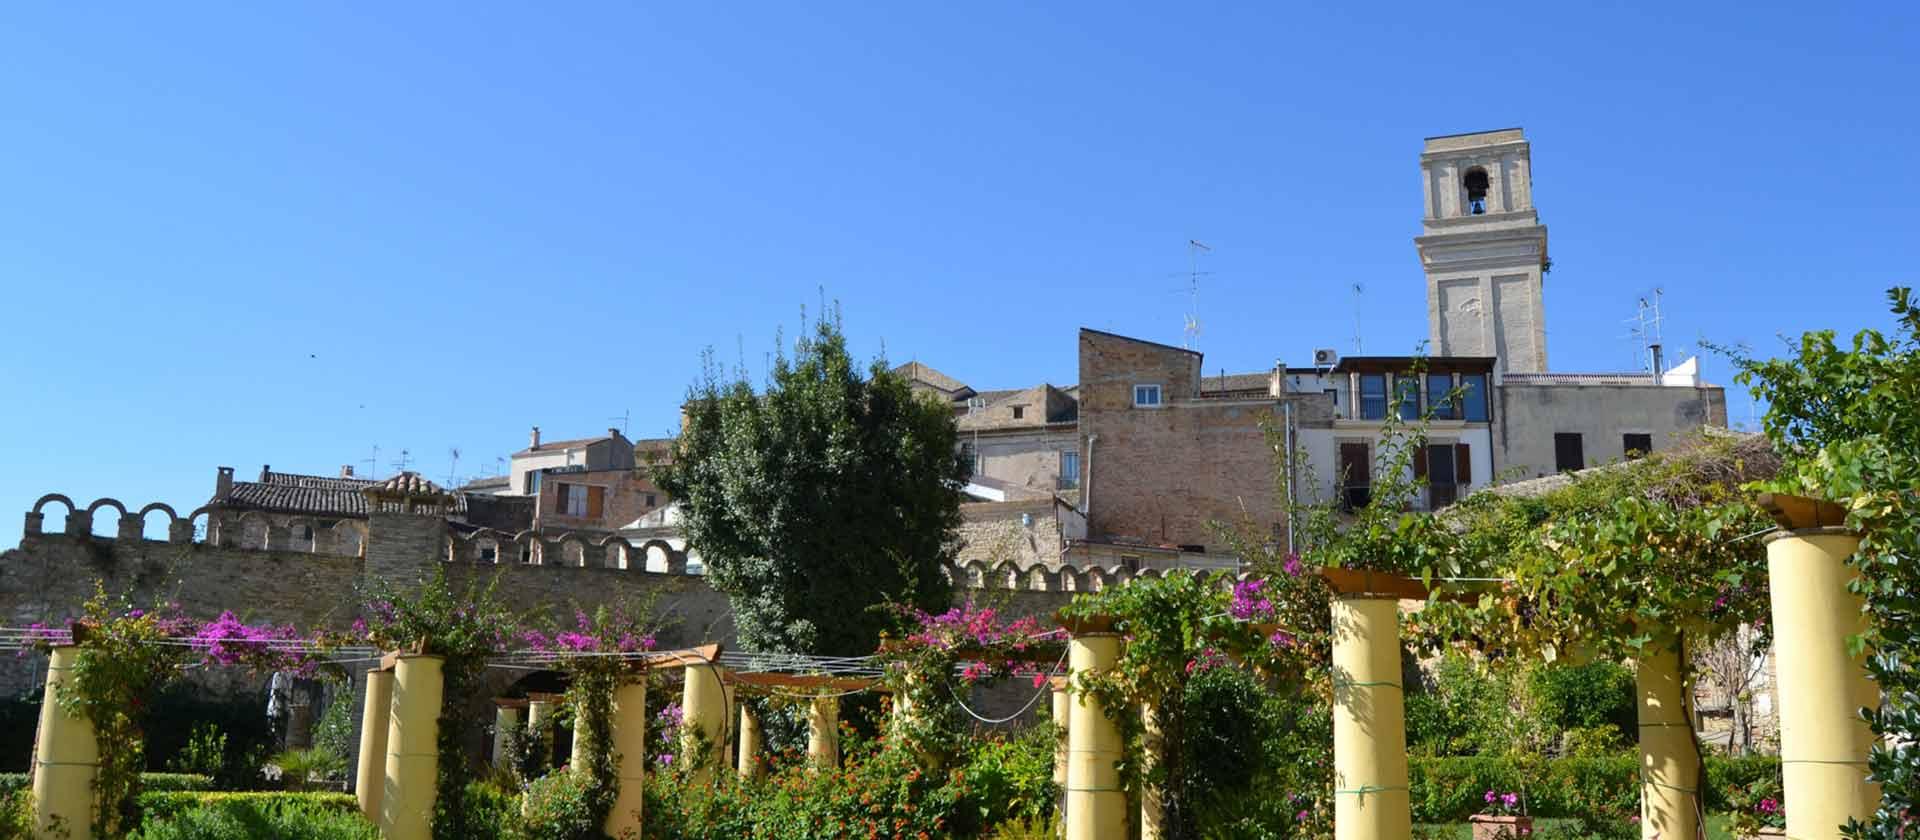 Vasto-Abruzzo-your-base-italia-sweet-italia-04